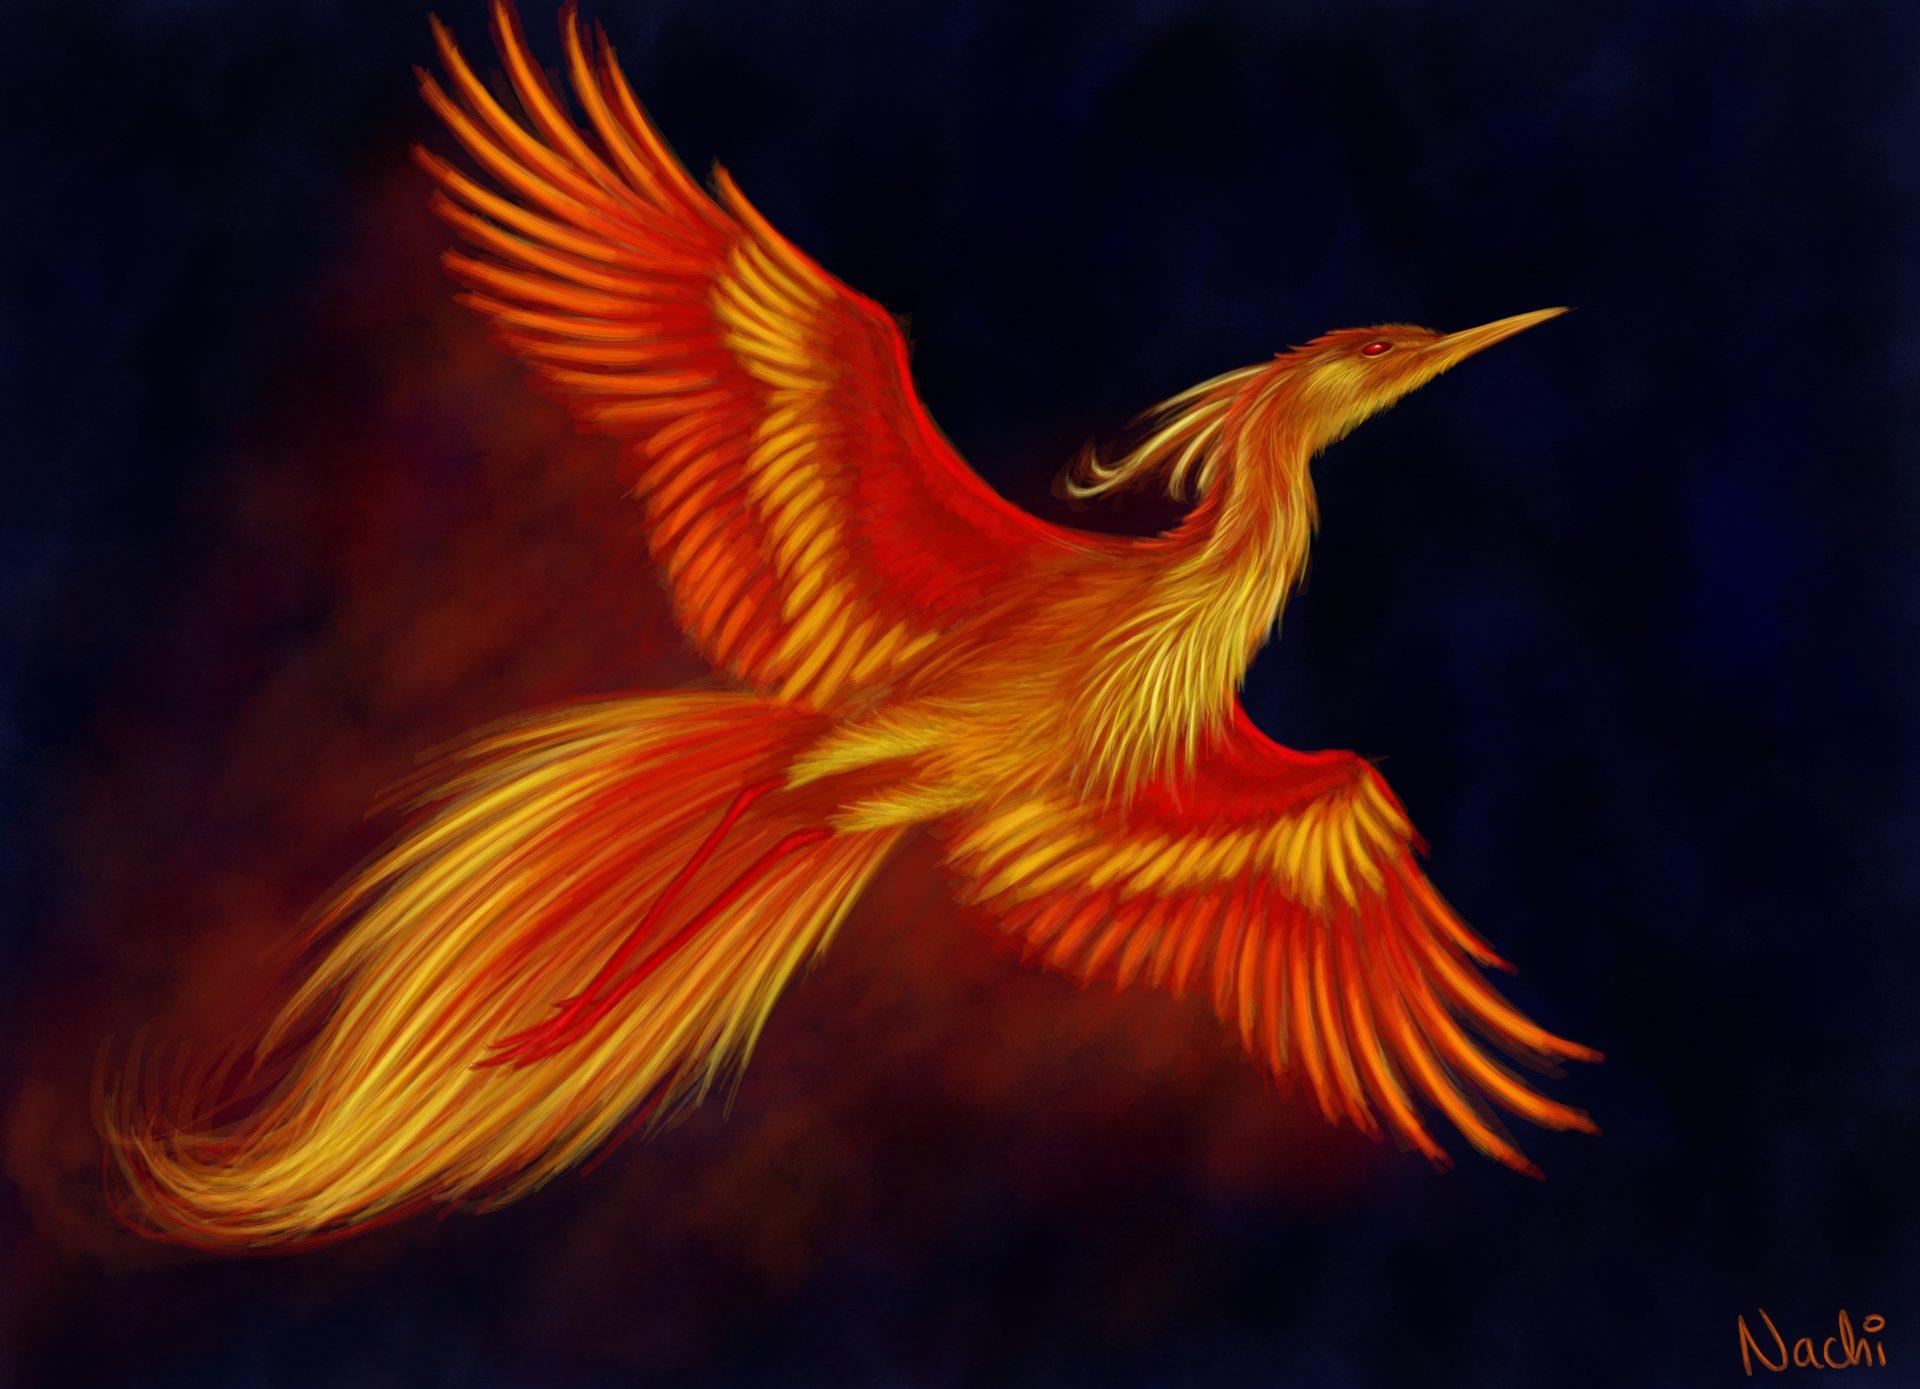 Firebird 5k retina ultra hd wallpaper background image 5845x4230 id 600284 wallpaper abyss - Fenix bird hd images ...